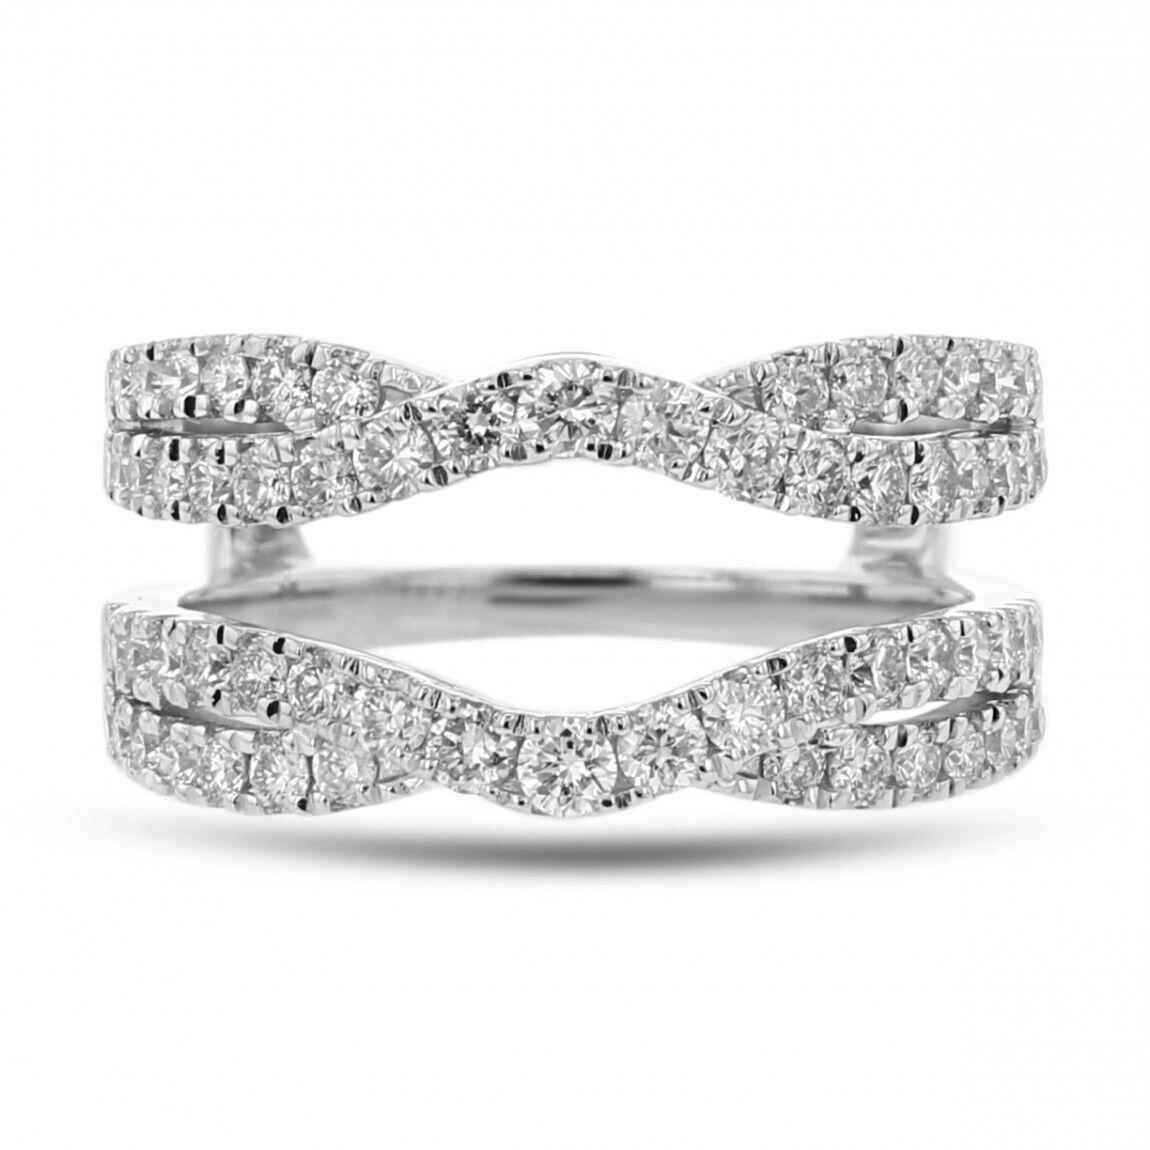 3.50 Ct Round Cut Diamond 14K Real White gold Enhancer Engagement Wrap Ring